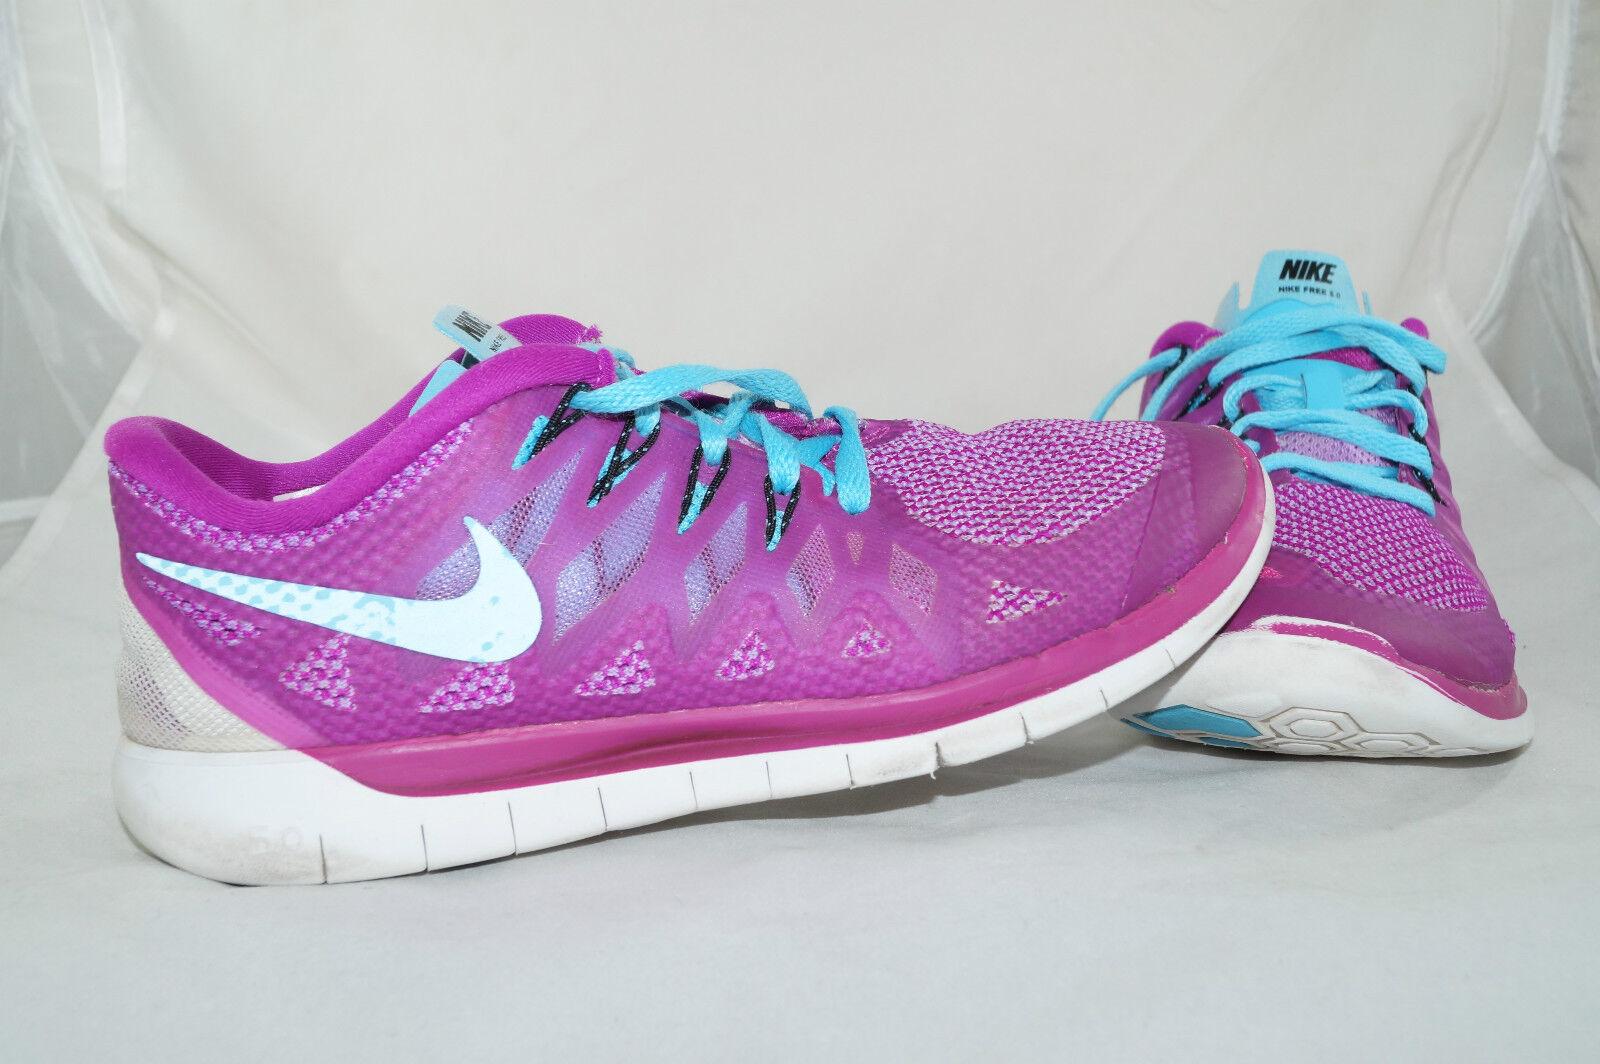 Zapatos promocionales para hombres y mujeres Nike FREE 5.0 GR: 38,5 - 37,5  Rosa Running Laufschuhe Jogging